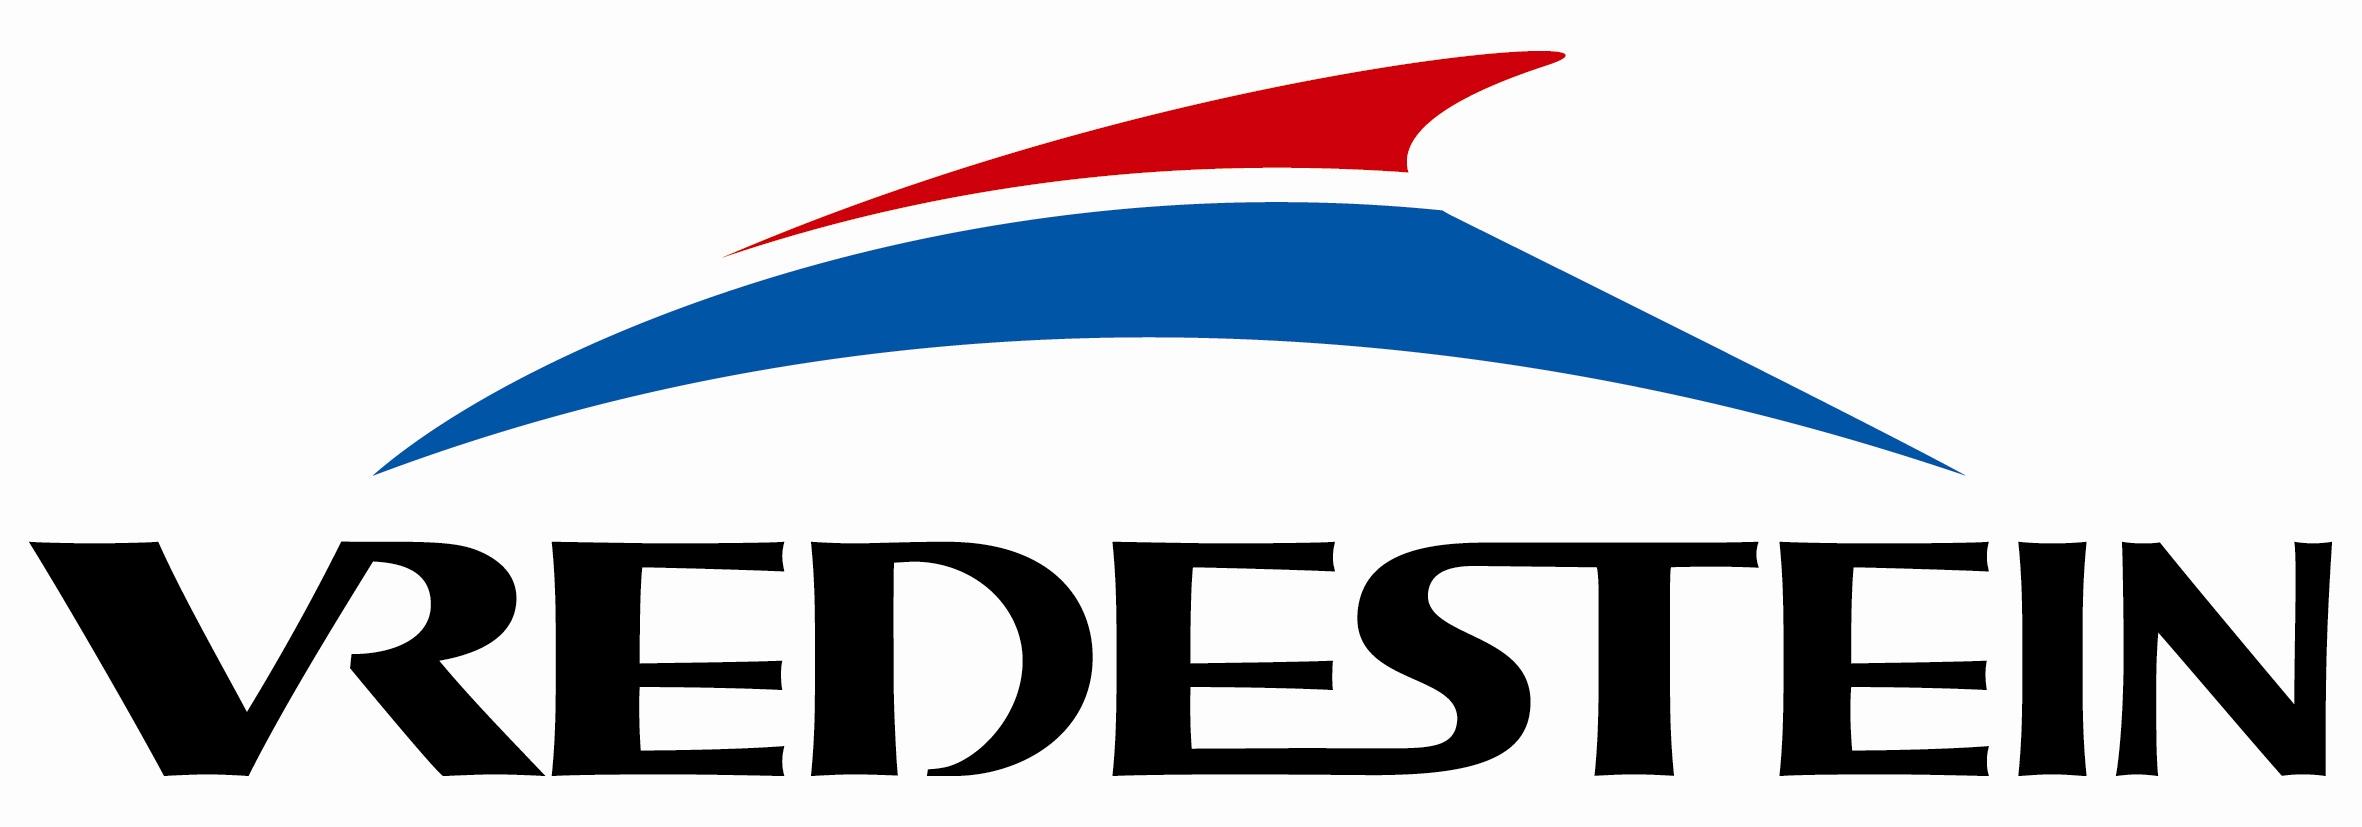 Logo de la marque Vredestein